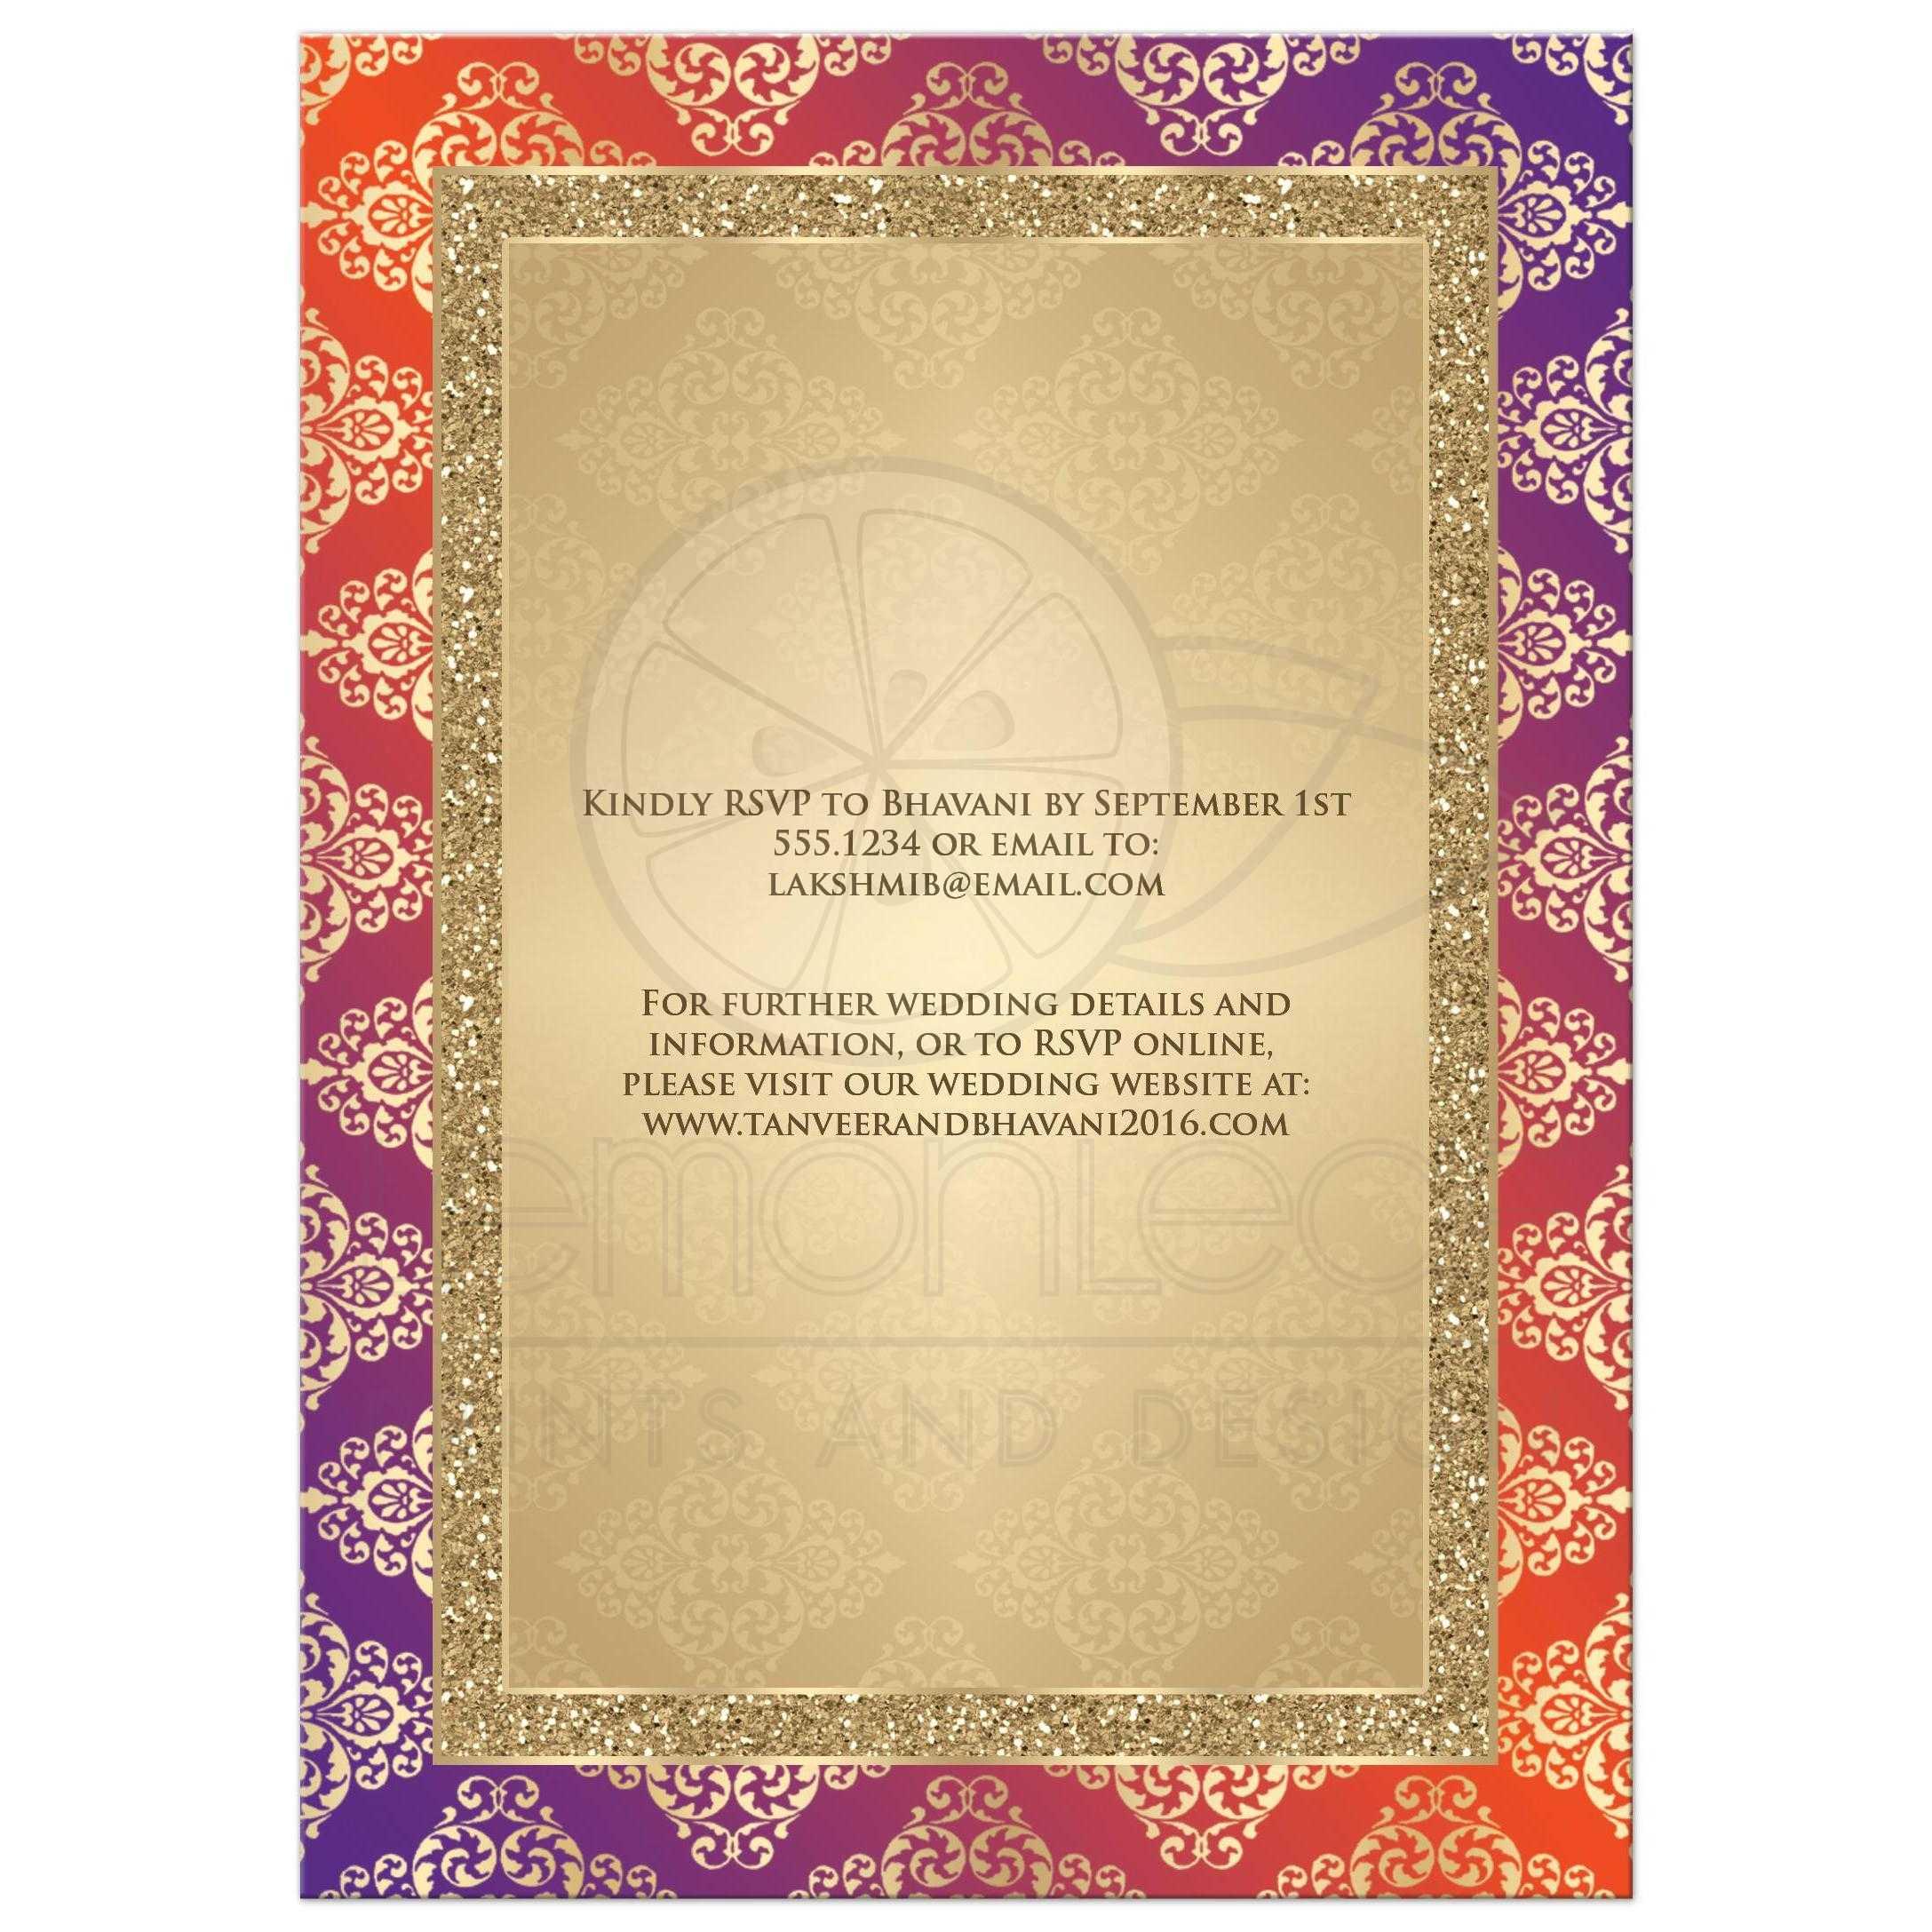 Attirant ... Gold Glitter And Scroll Affordable Hindu, Indian, Muslim Wedding Invites  ...